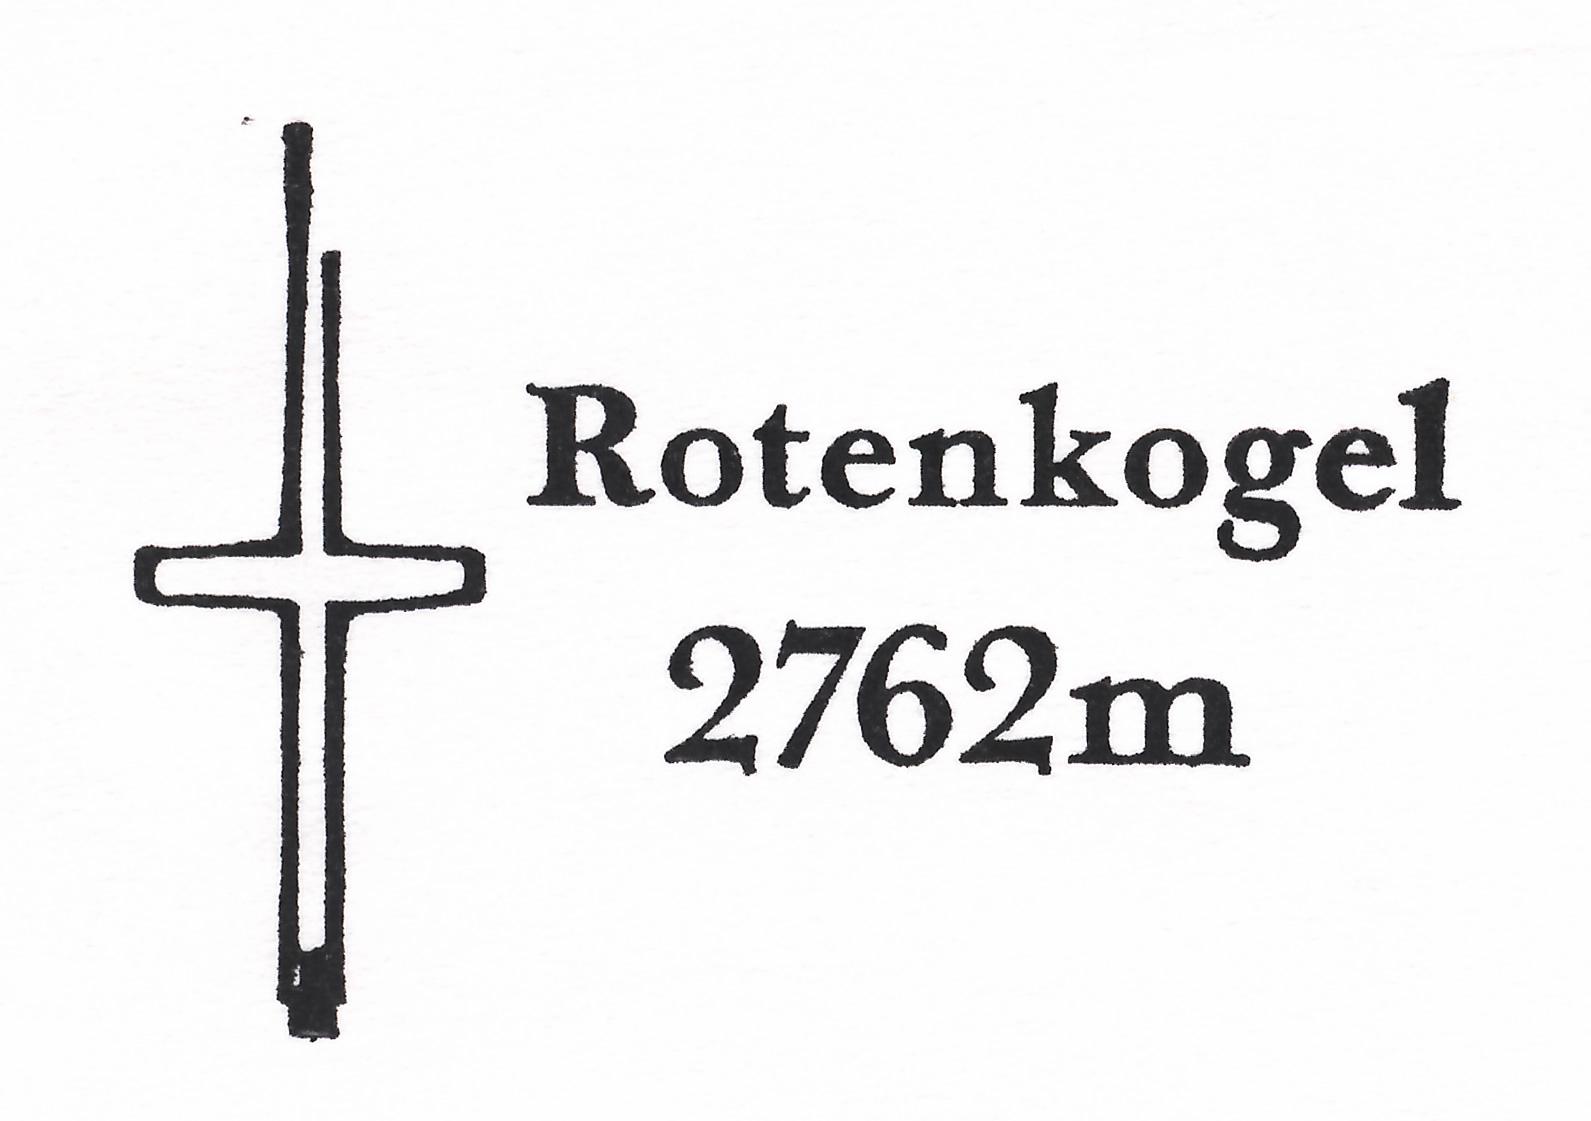 Rotenkogel 2762m